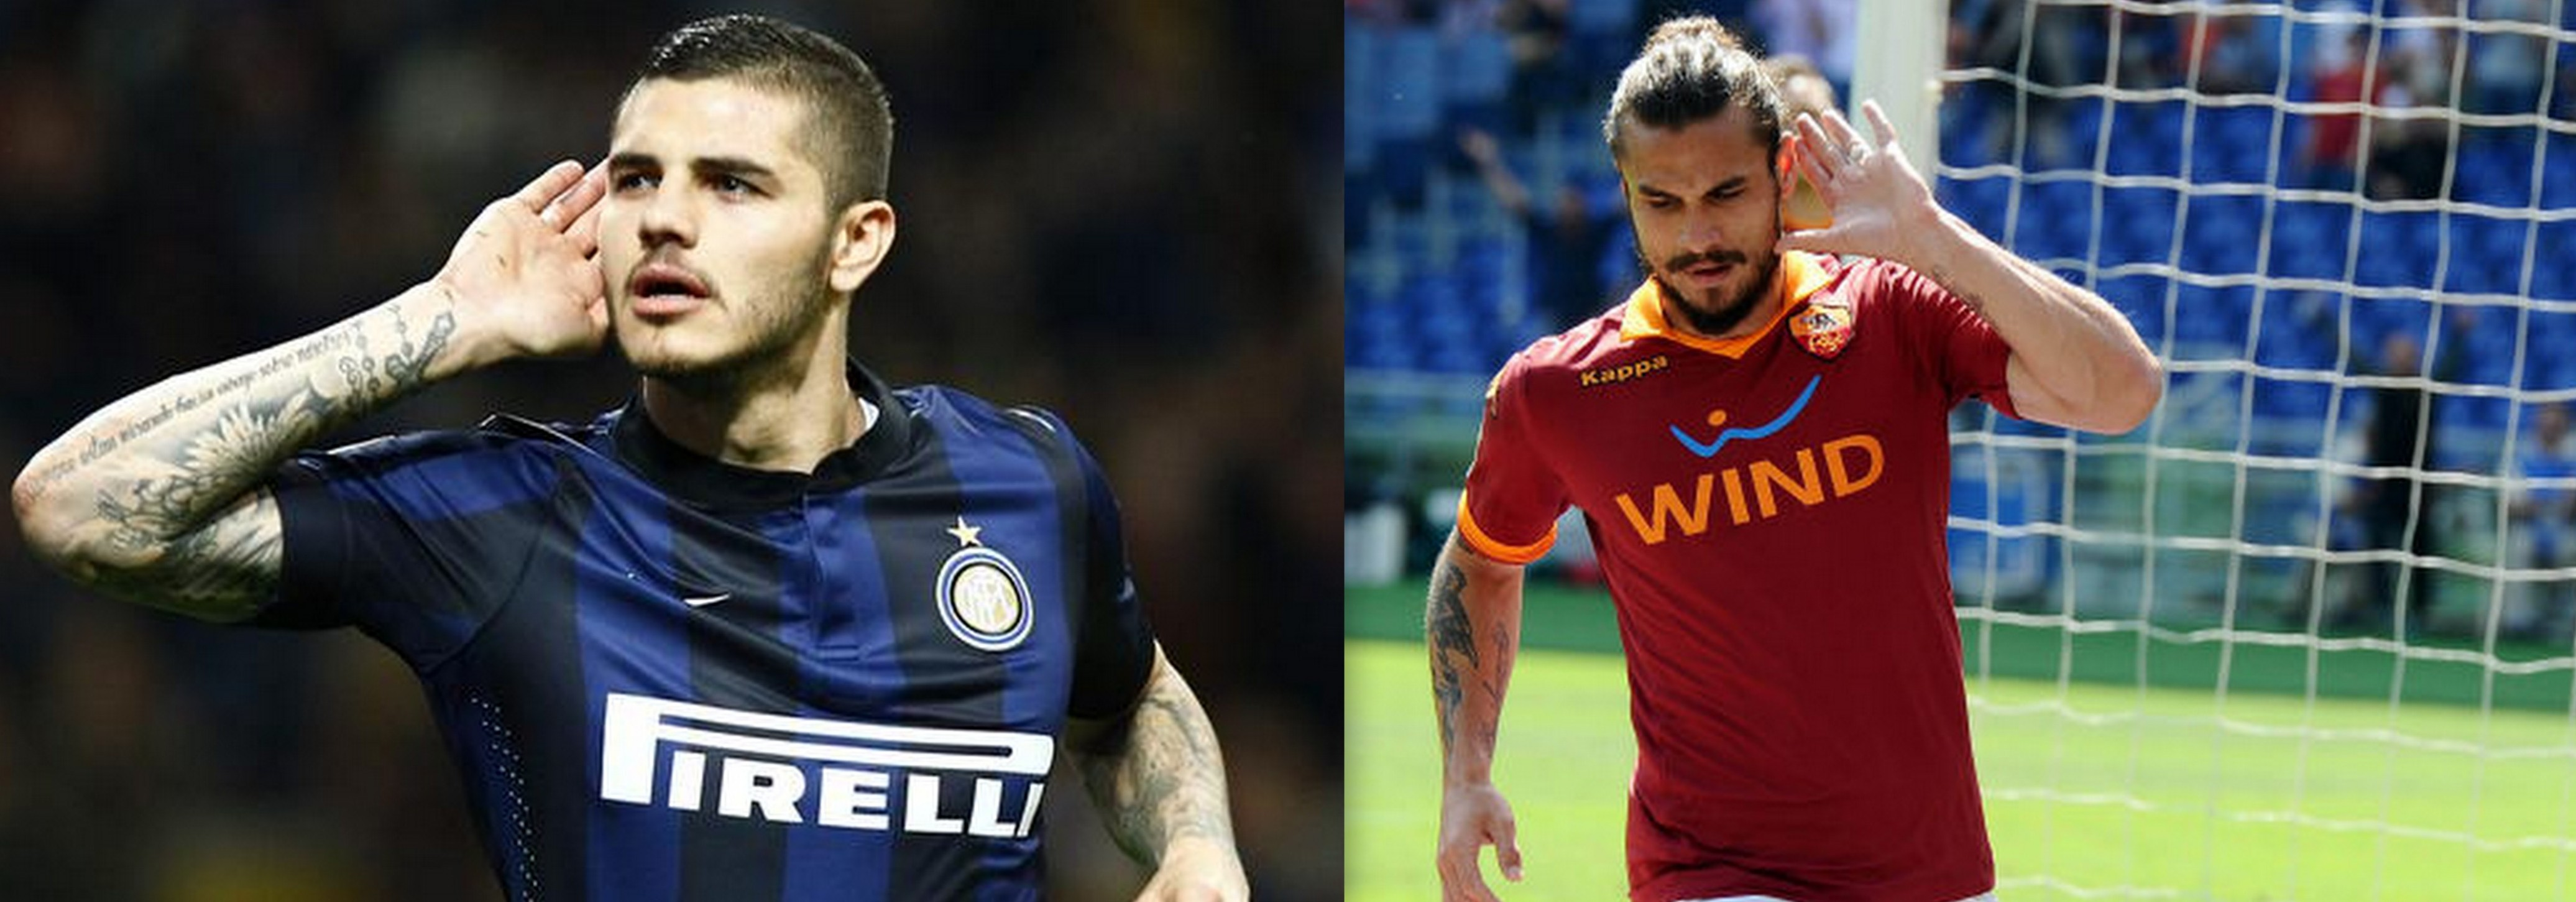 Icardi e Osvaldo, prossimamente insieme all'Inter?